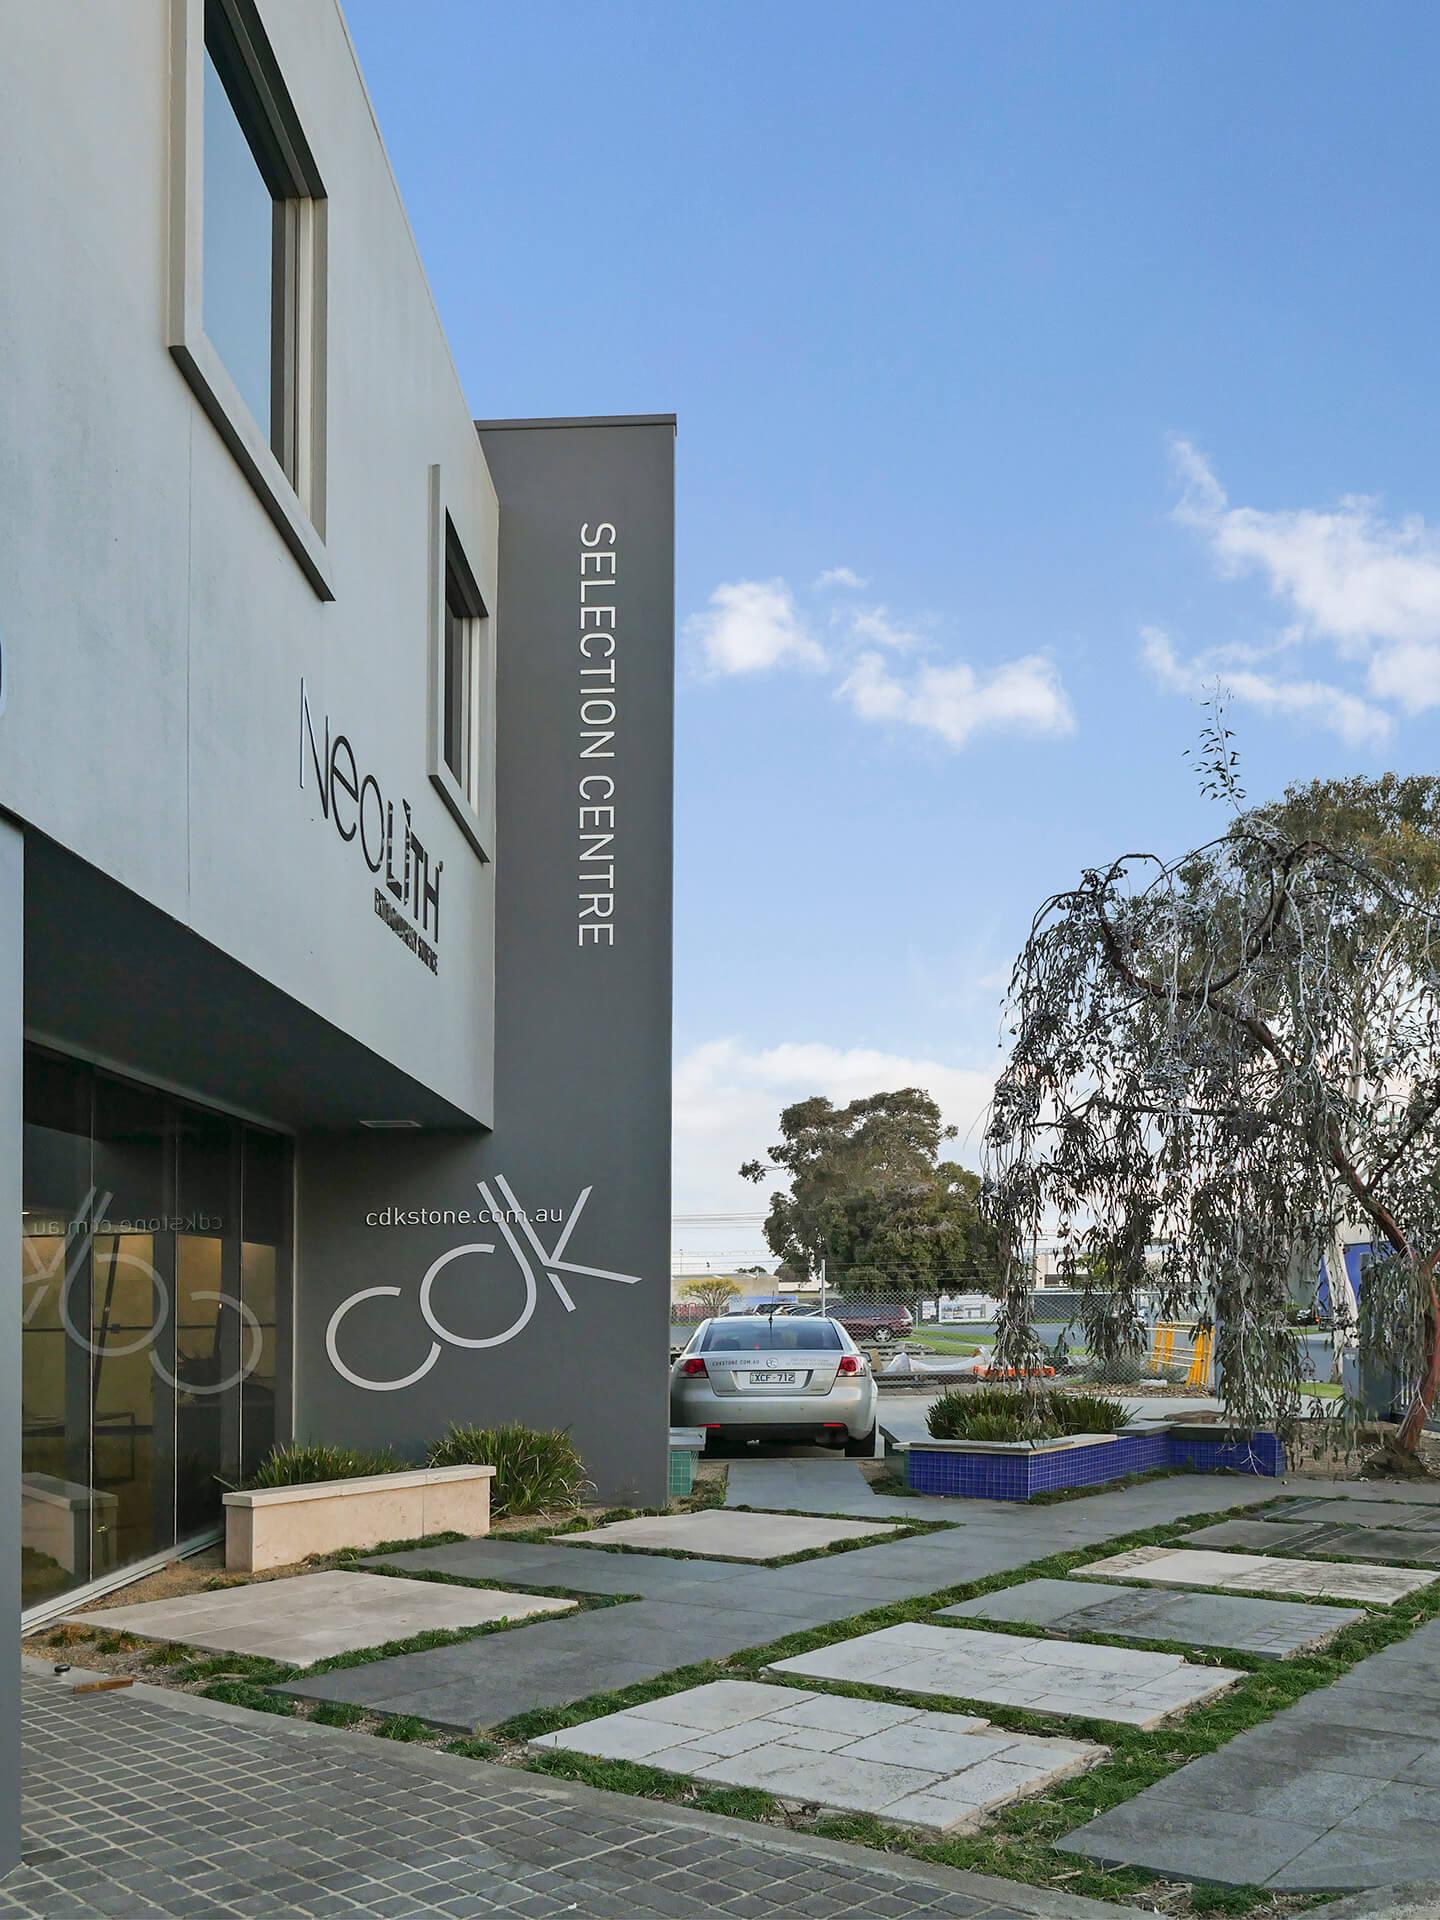 CDK Stone Commercial job Sydney